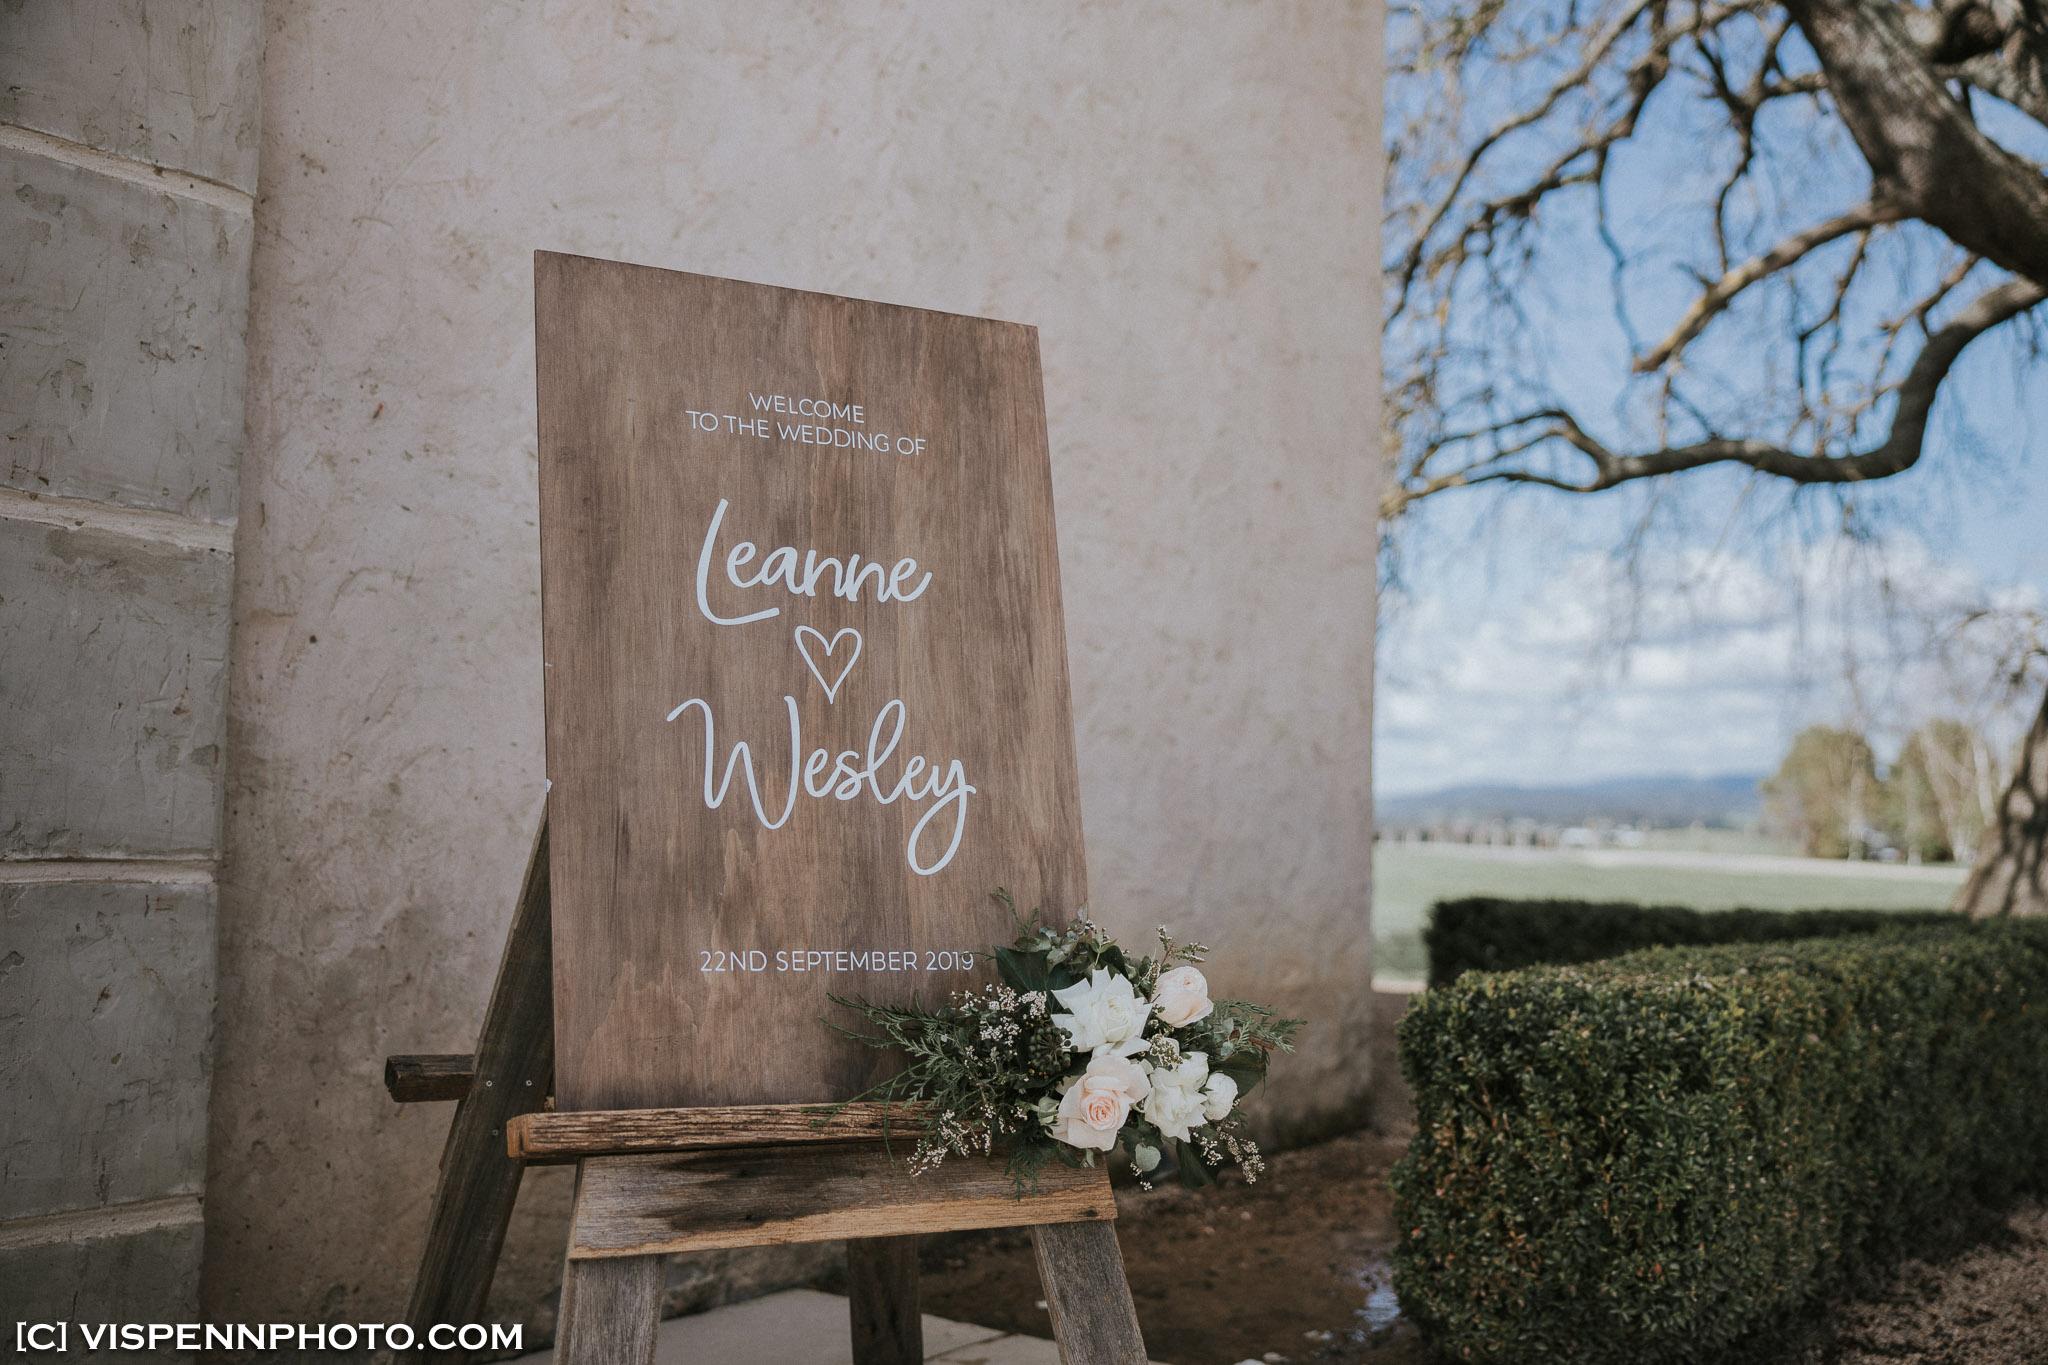 WEDDING DAY Photography Melbourne VISPENN 墨尔本 婚礼跟拍 婚礼摄像 婚礼摄影 结婚照 登记照 LeanneWesley 02509 1P EOSR VISPENN